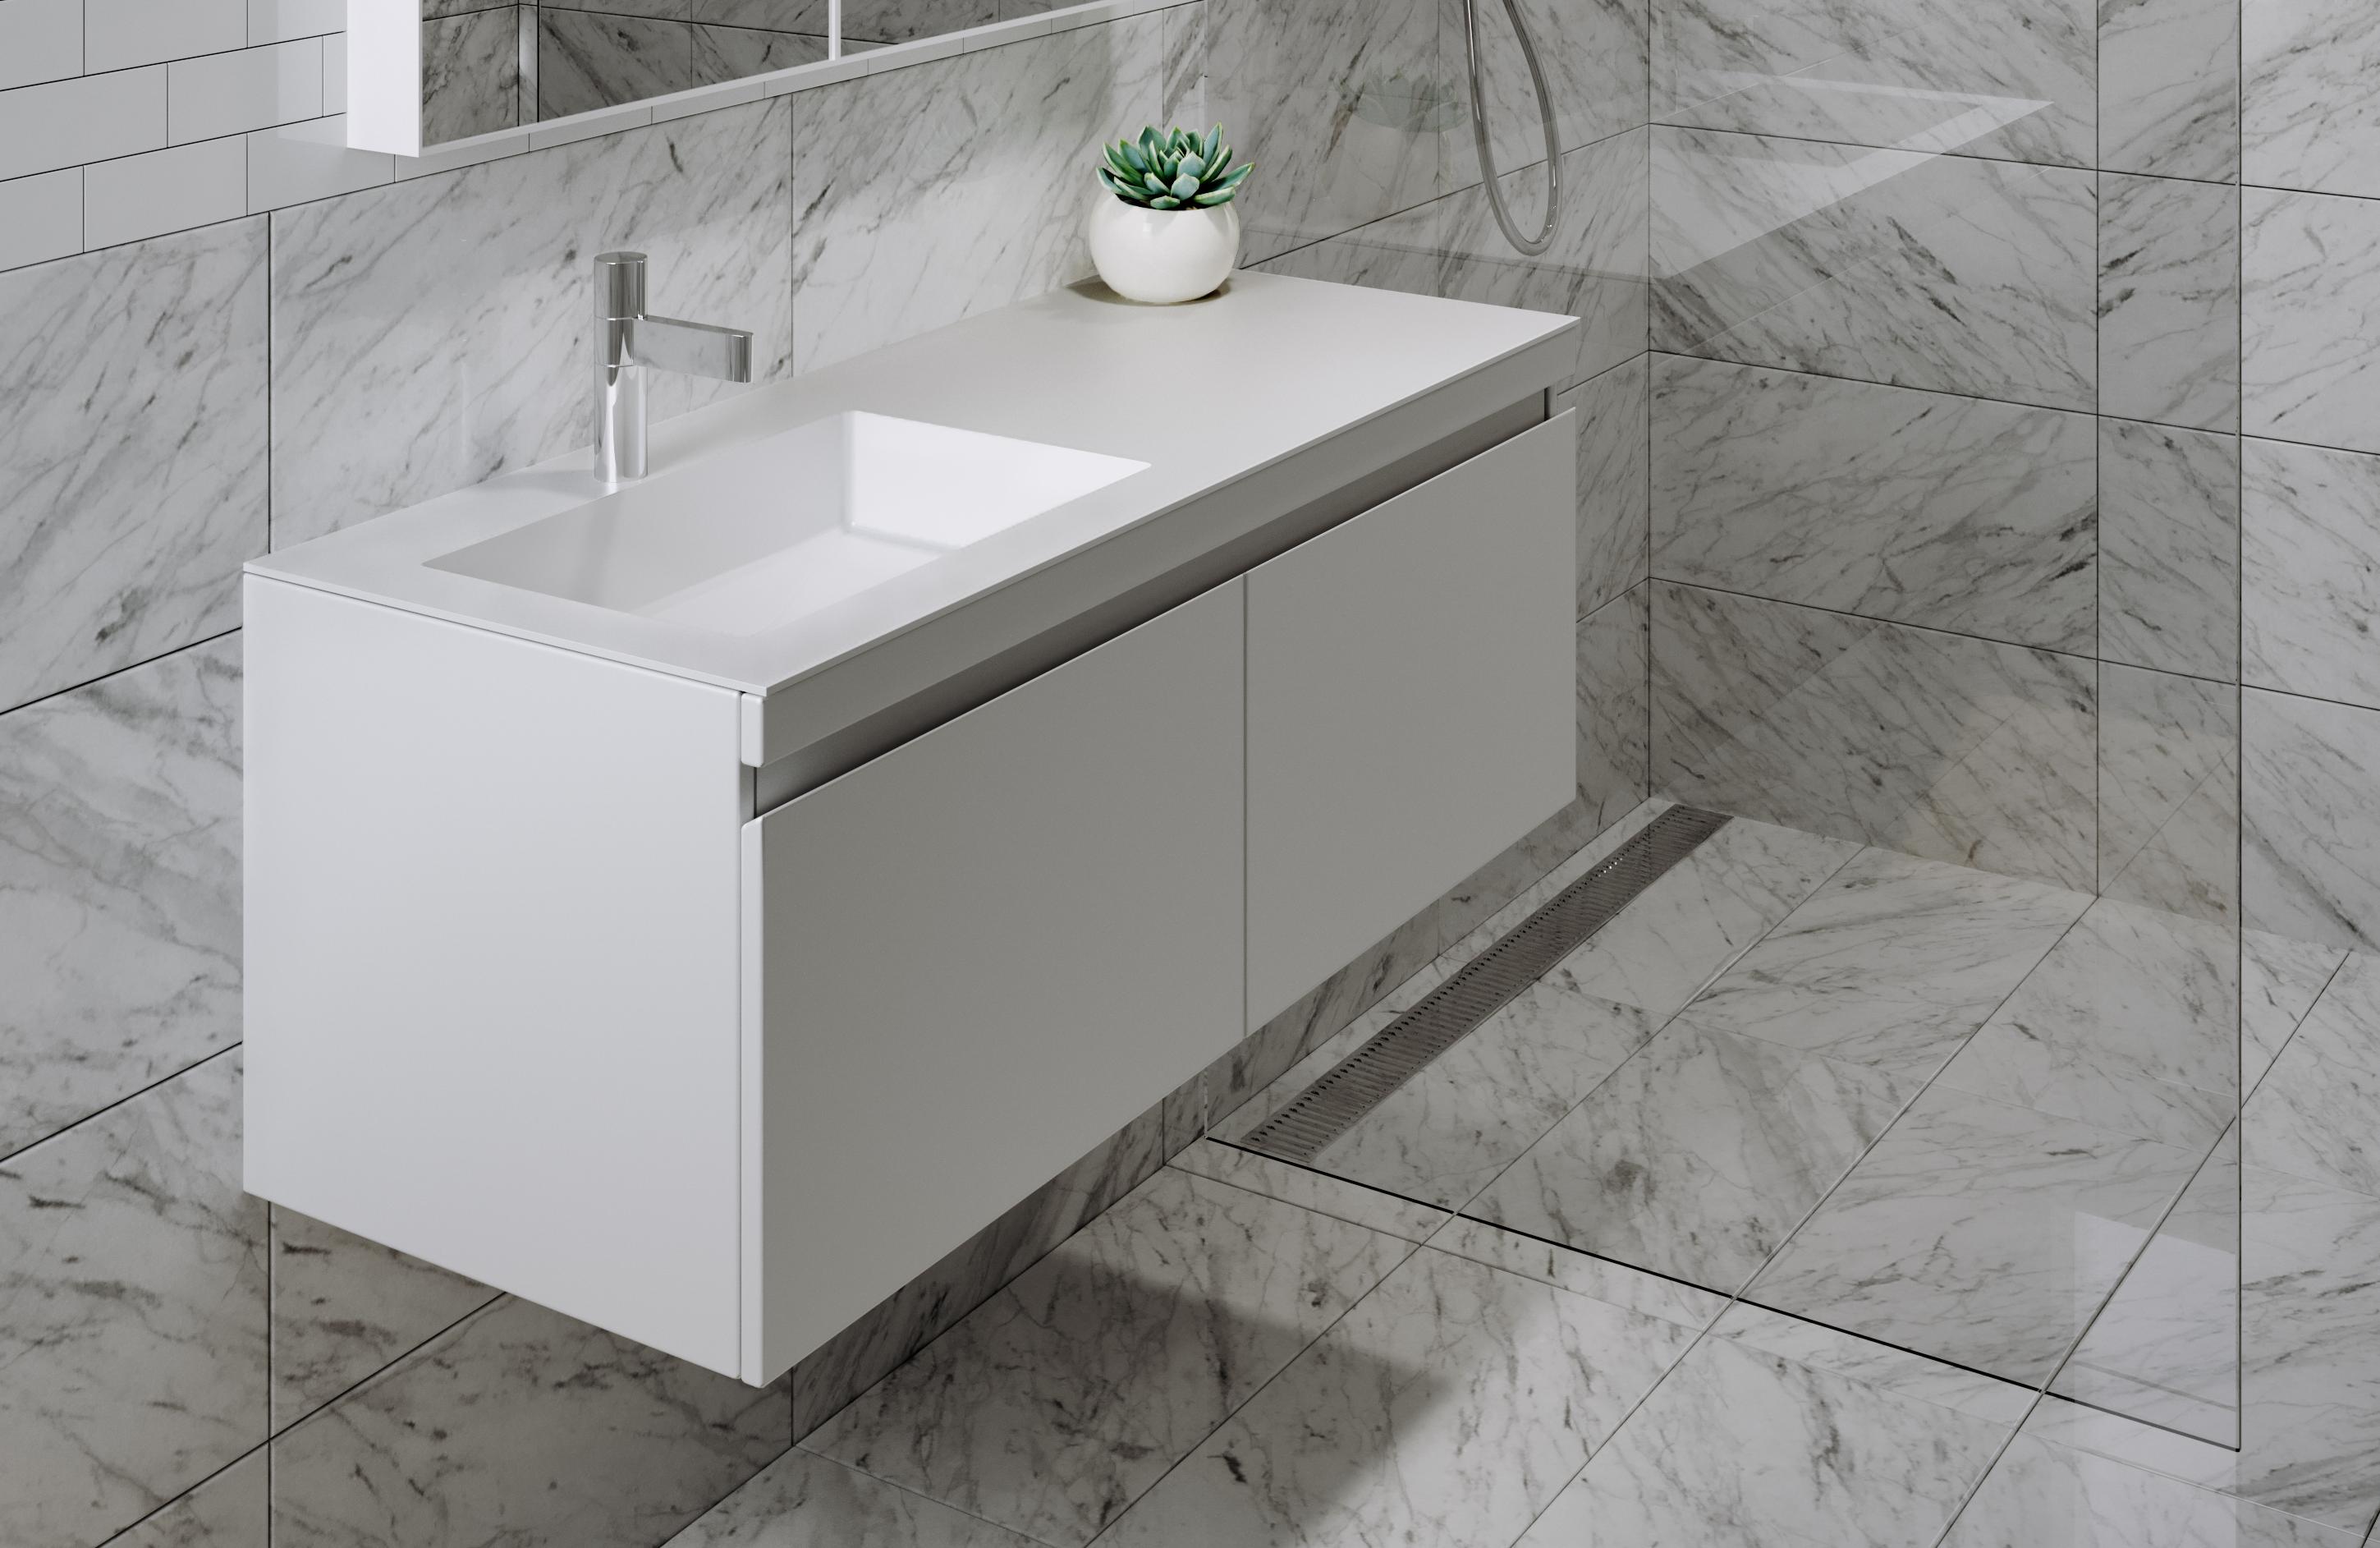 Contemporary Urban Bath Vanity Light: Urban 1200 MK II Vanity